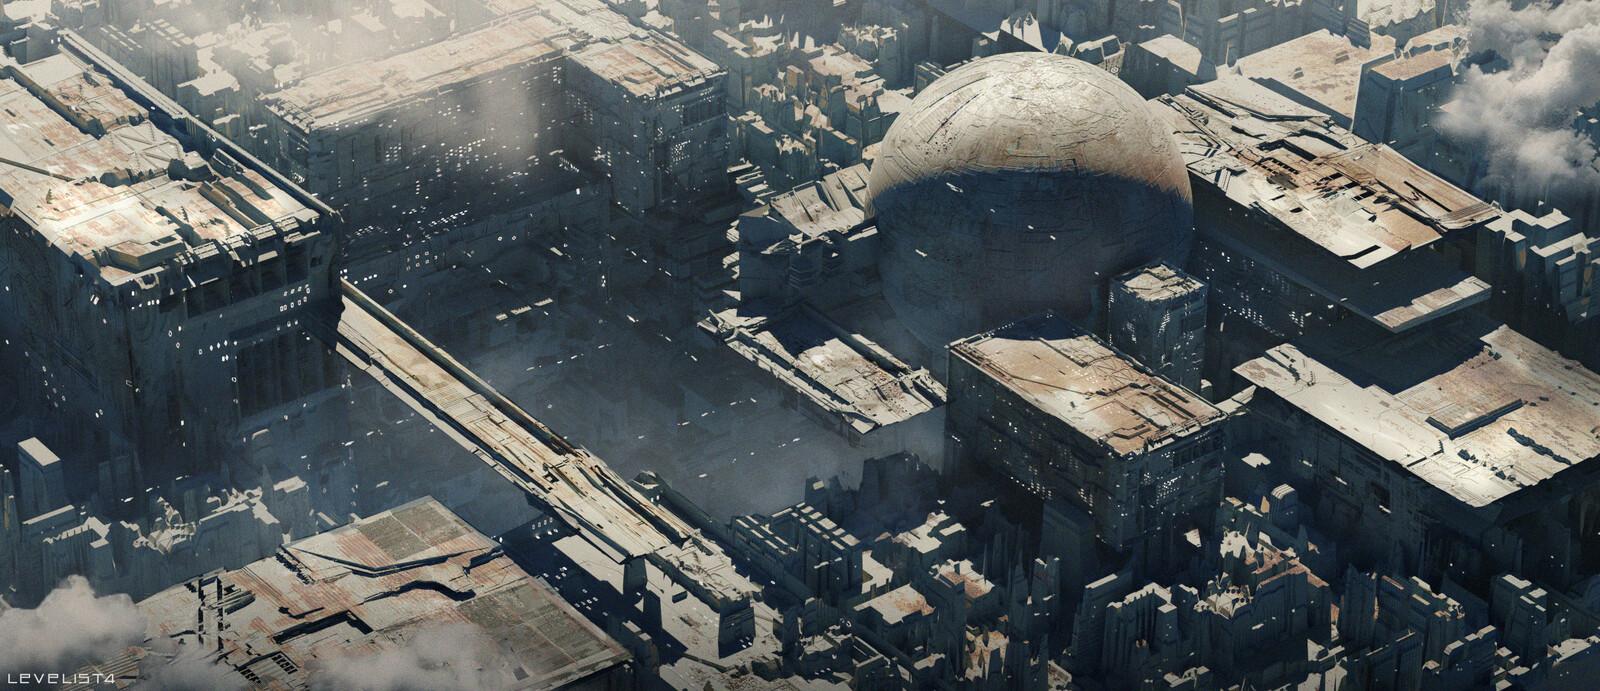 Post-Apocalyptic Sci-fi city practice